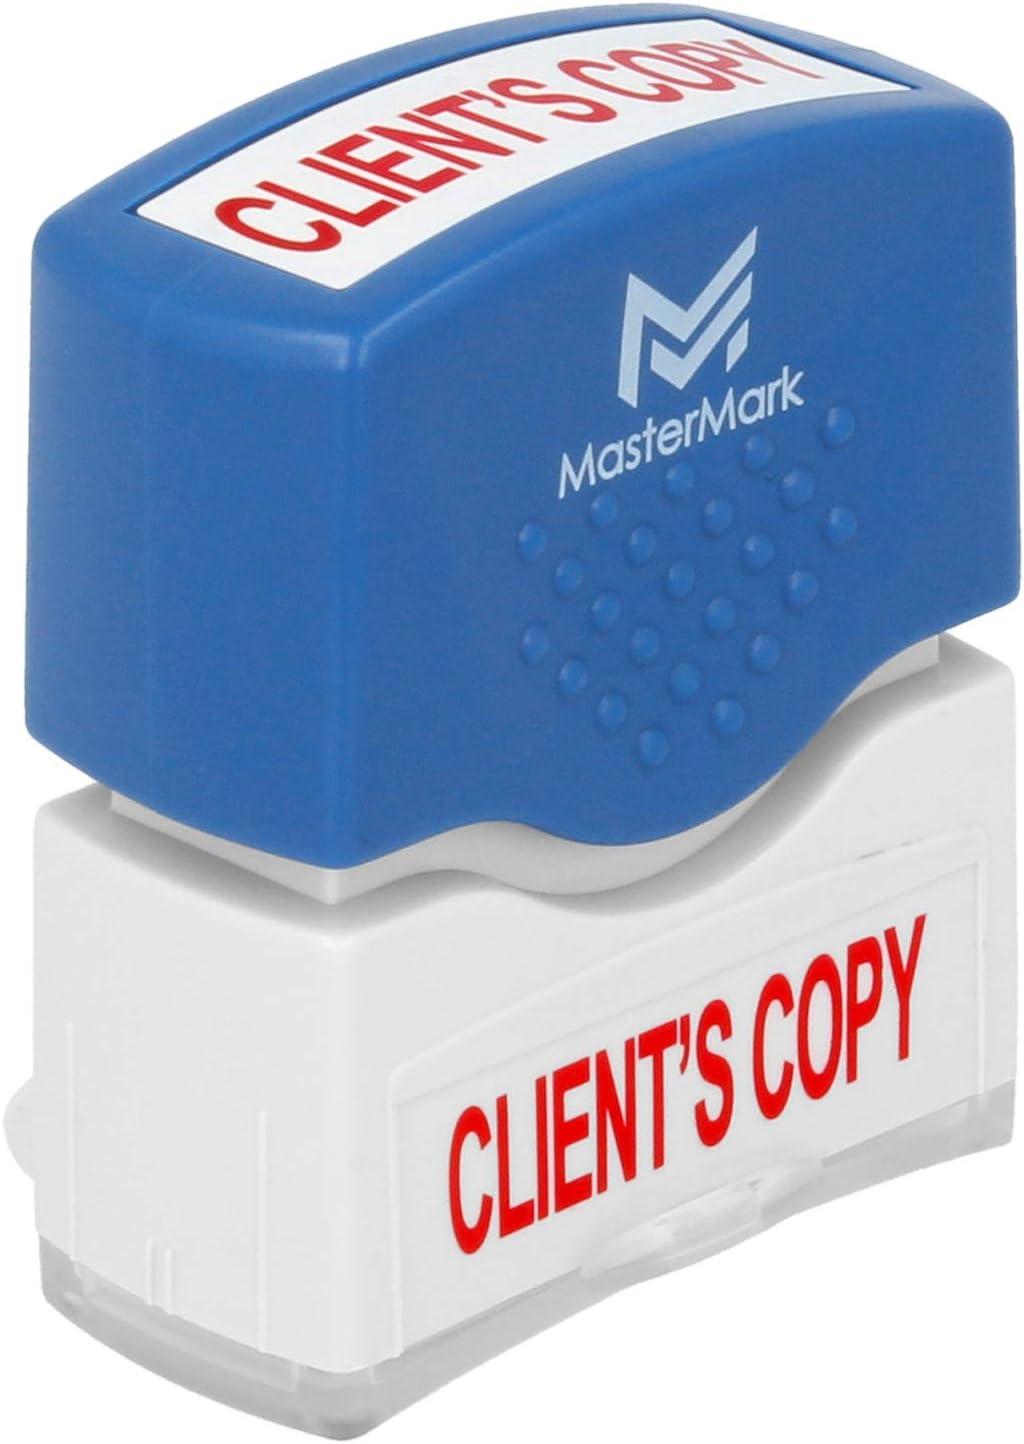 Client's Copy Stamp – MasterMark Premium Pre-Inked Office Stamp